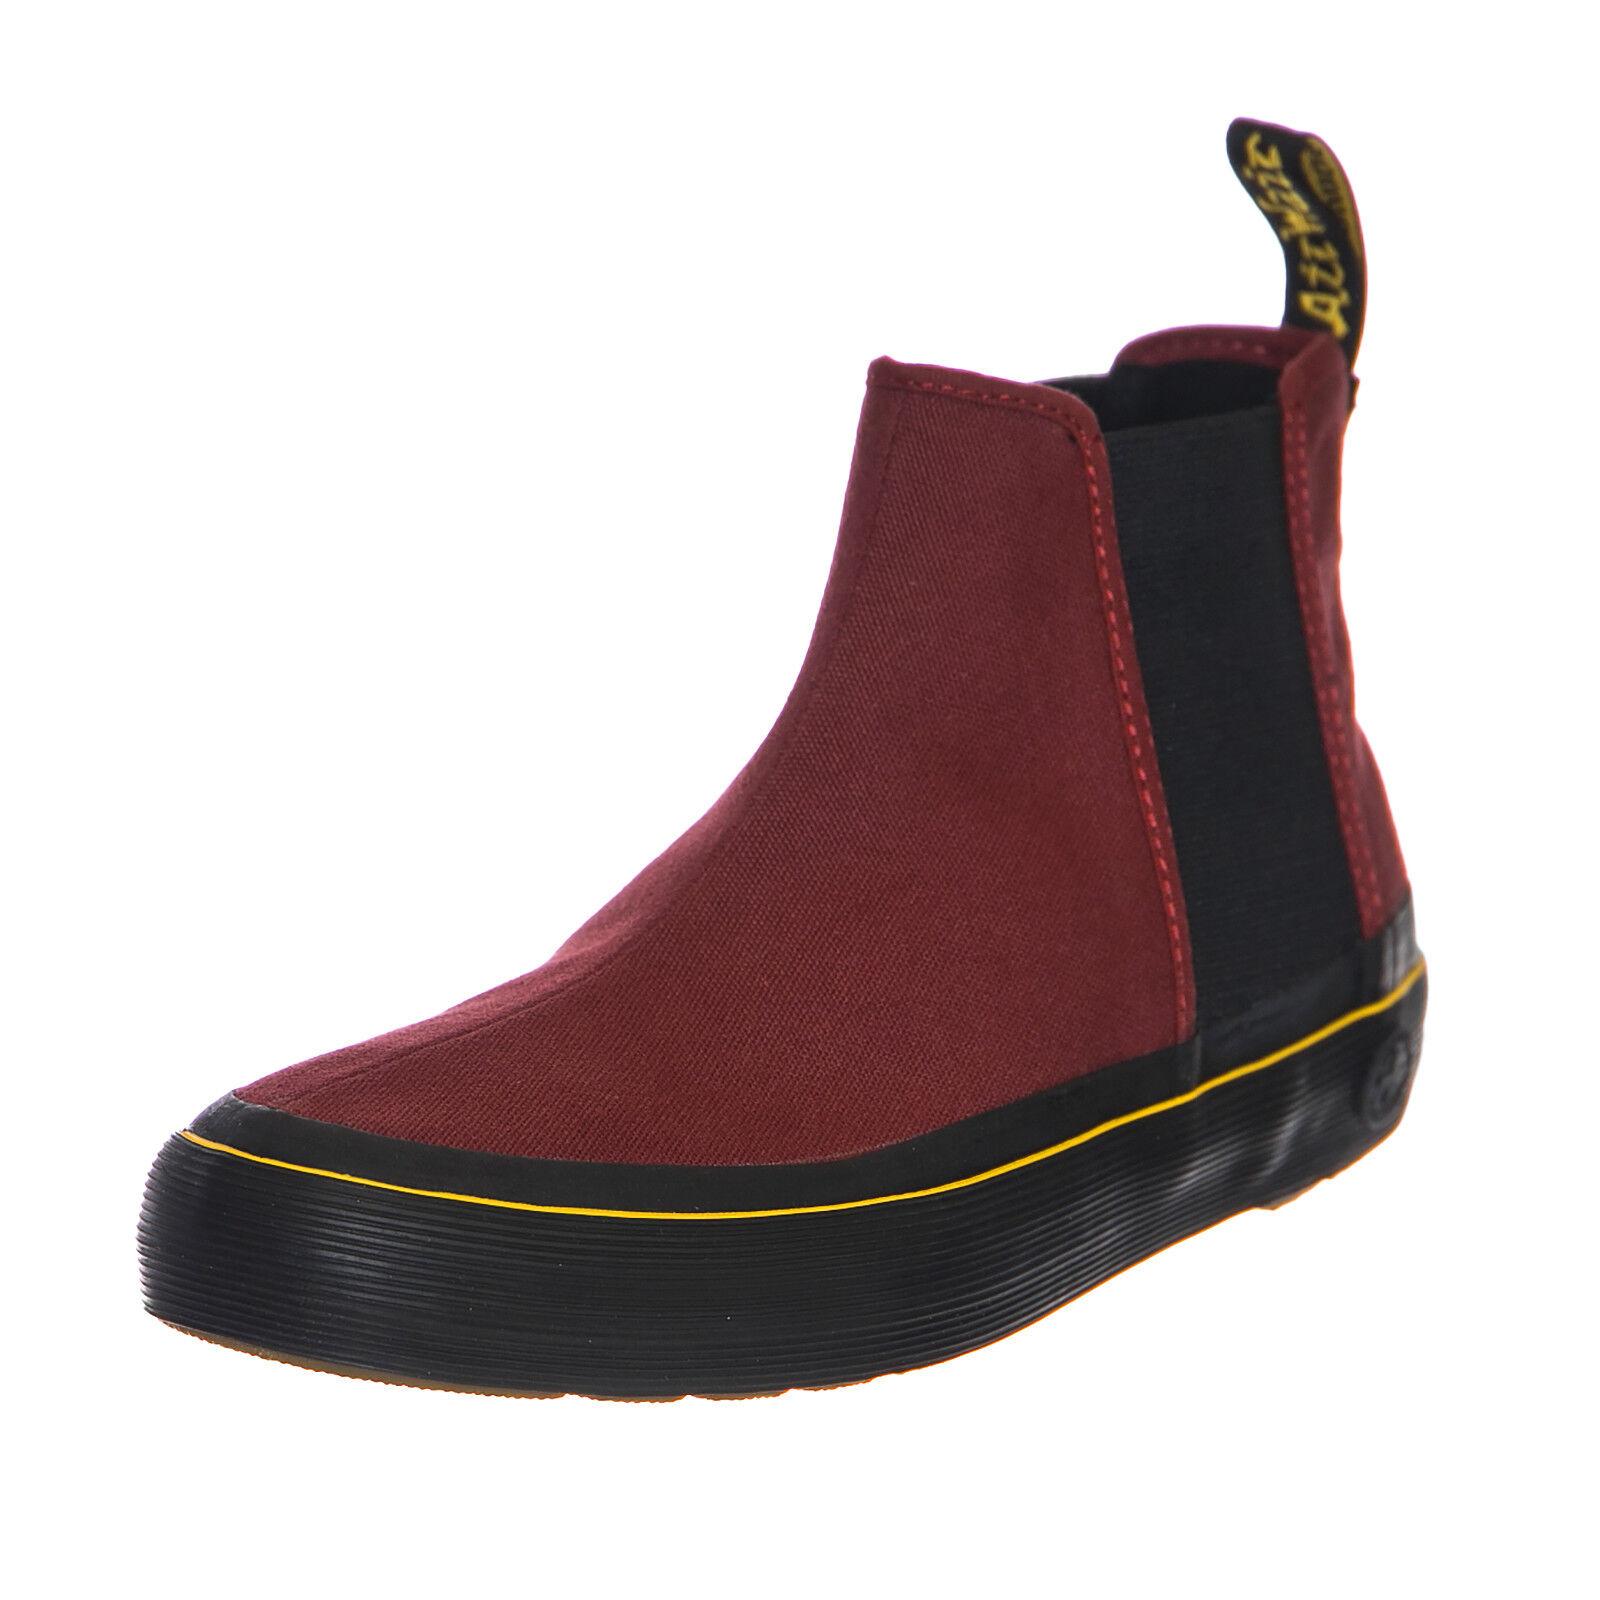 Dr.Martens Sneakers Phoebe Cherry Red Canvas Bordeaux